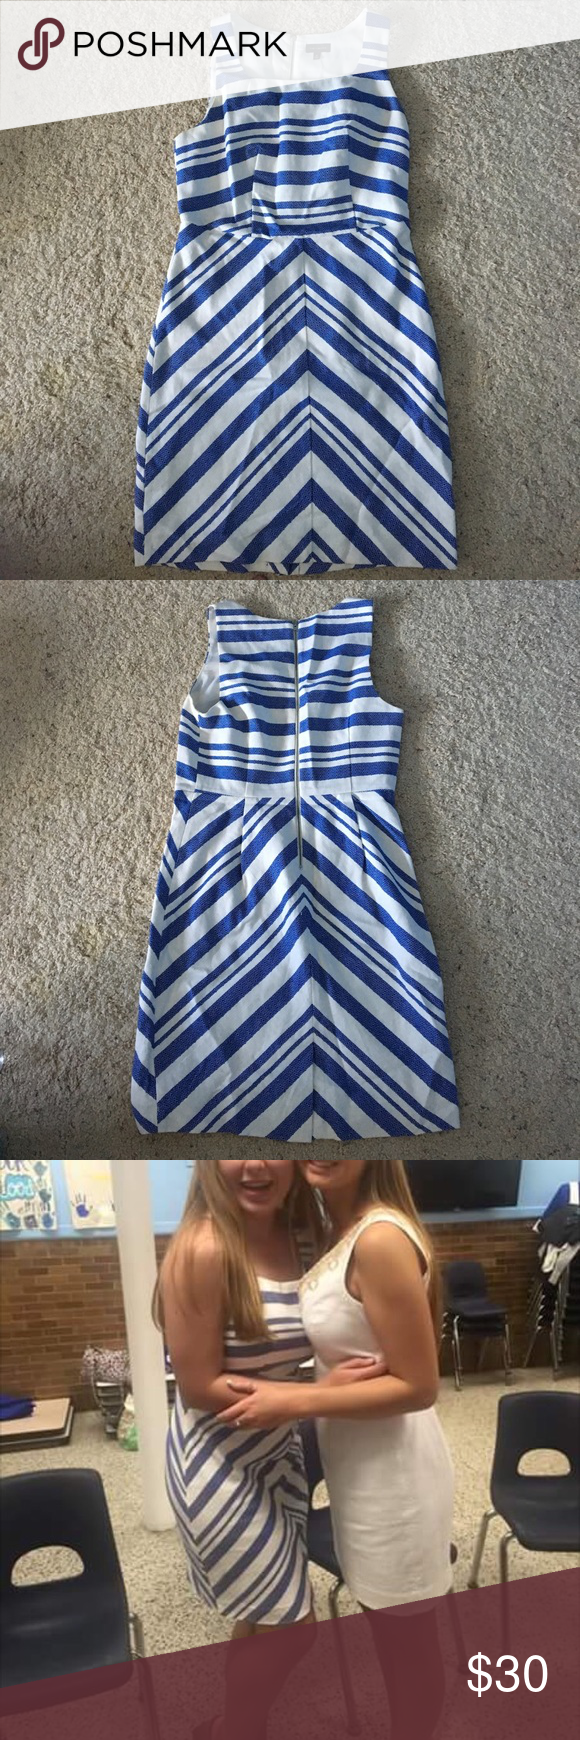 Blue and white elegant dress